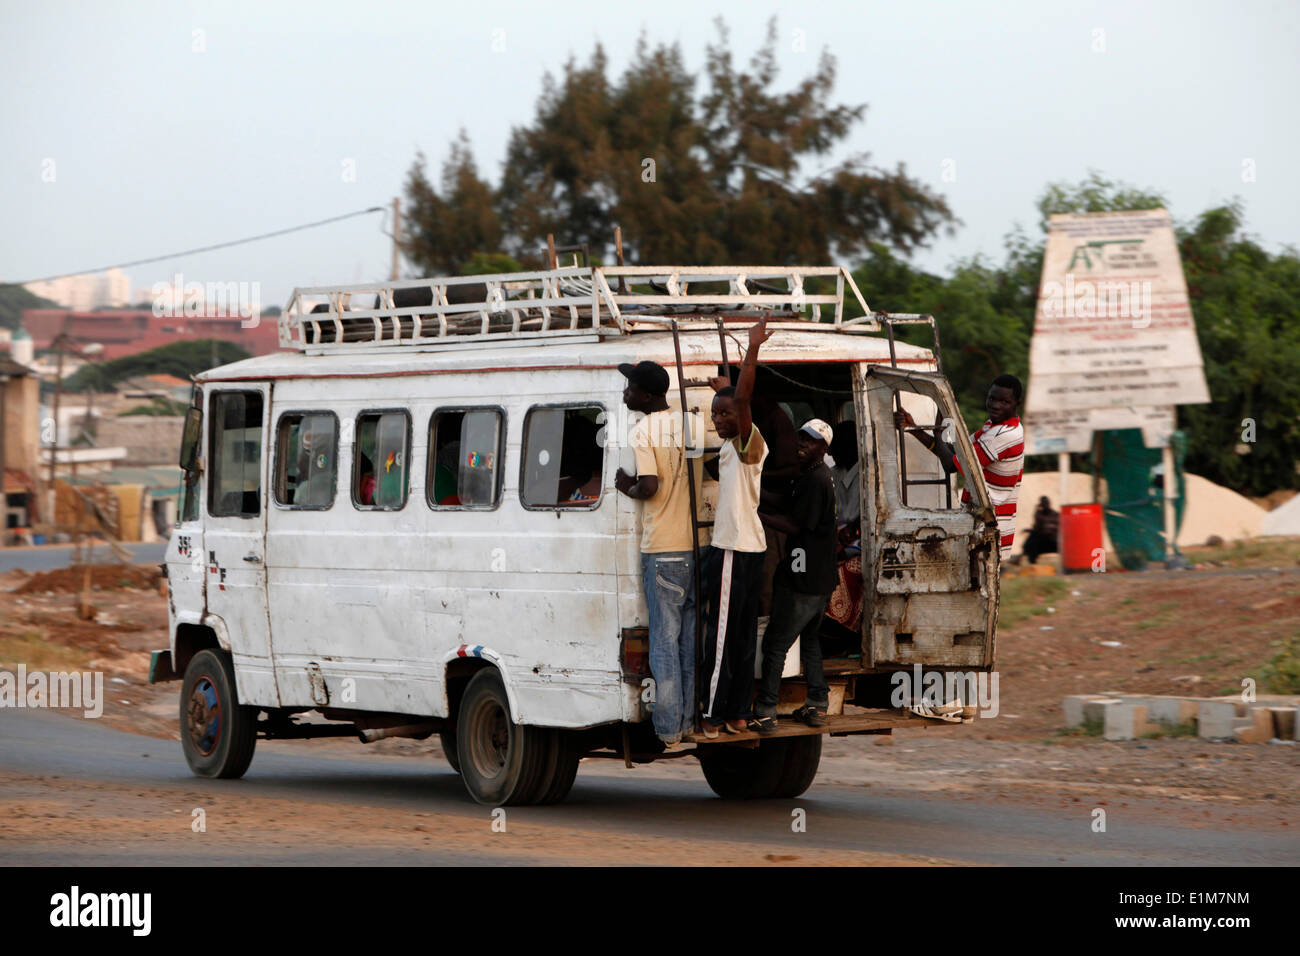 Public transport - Stock Image